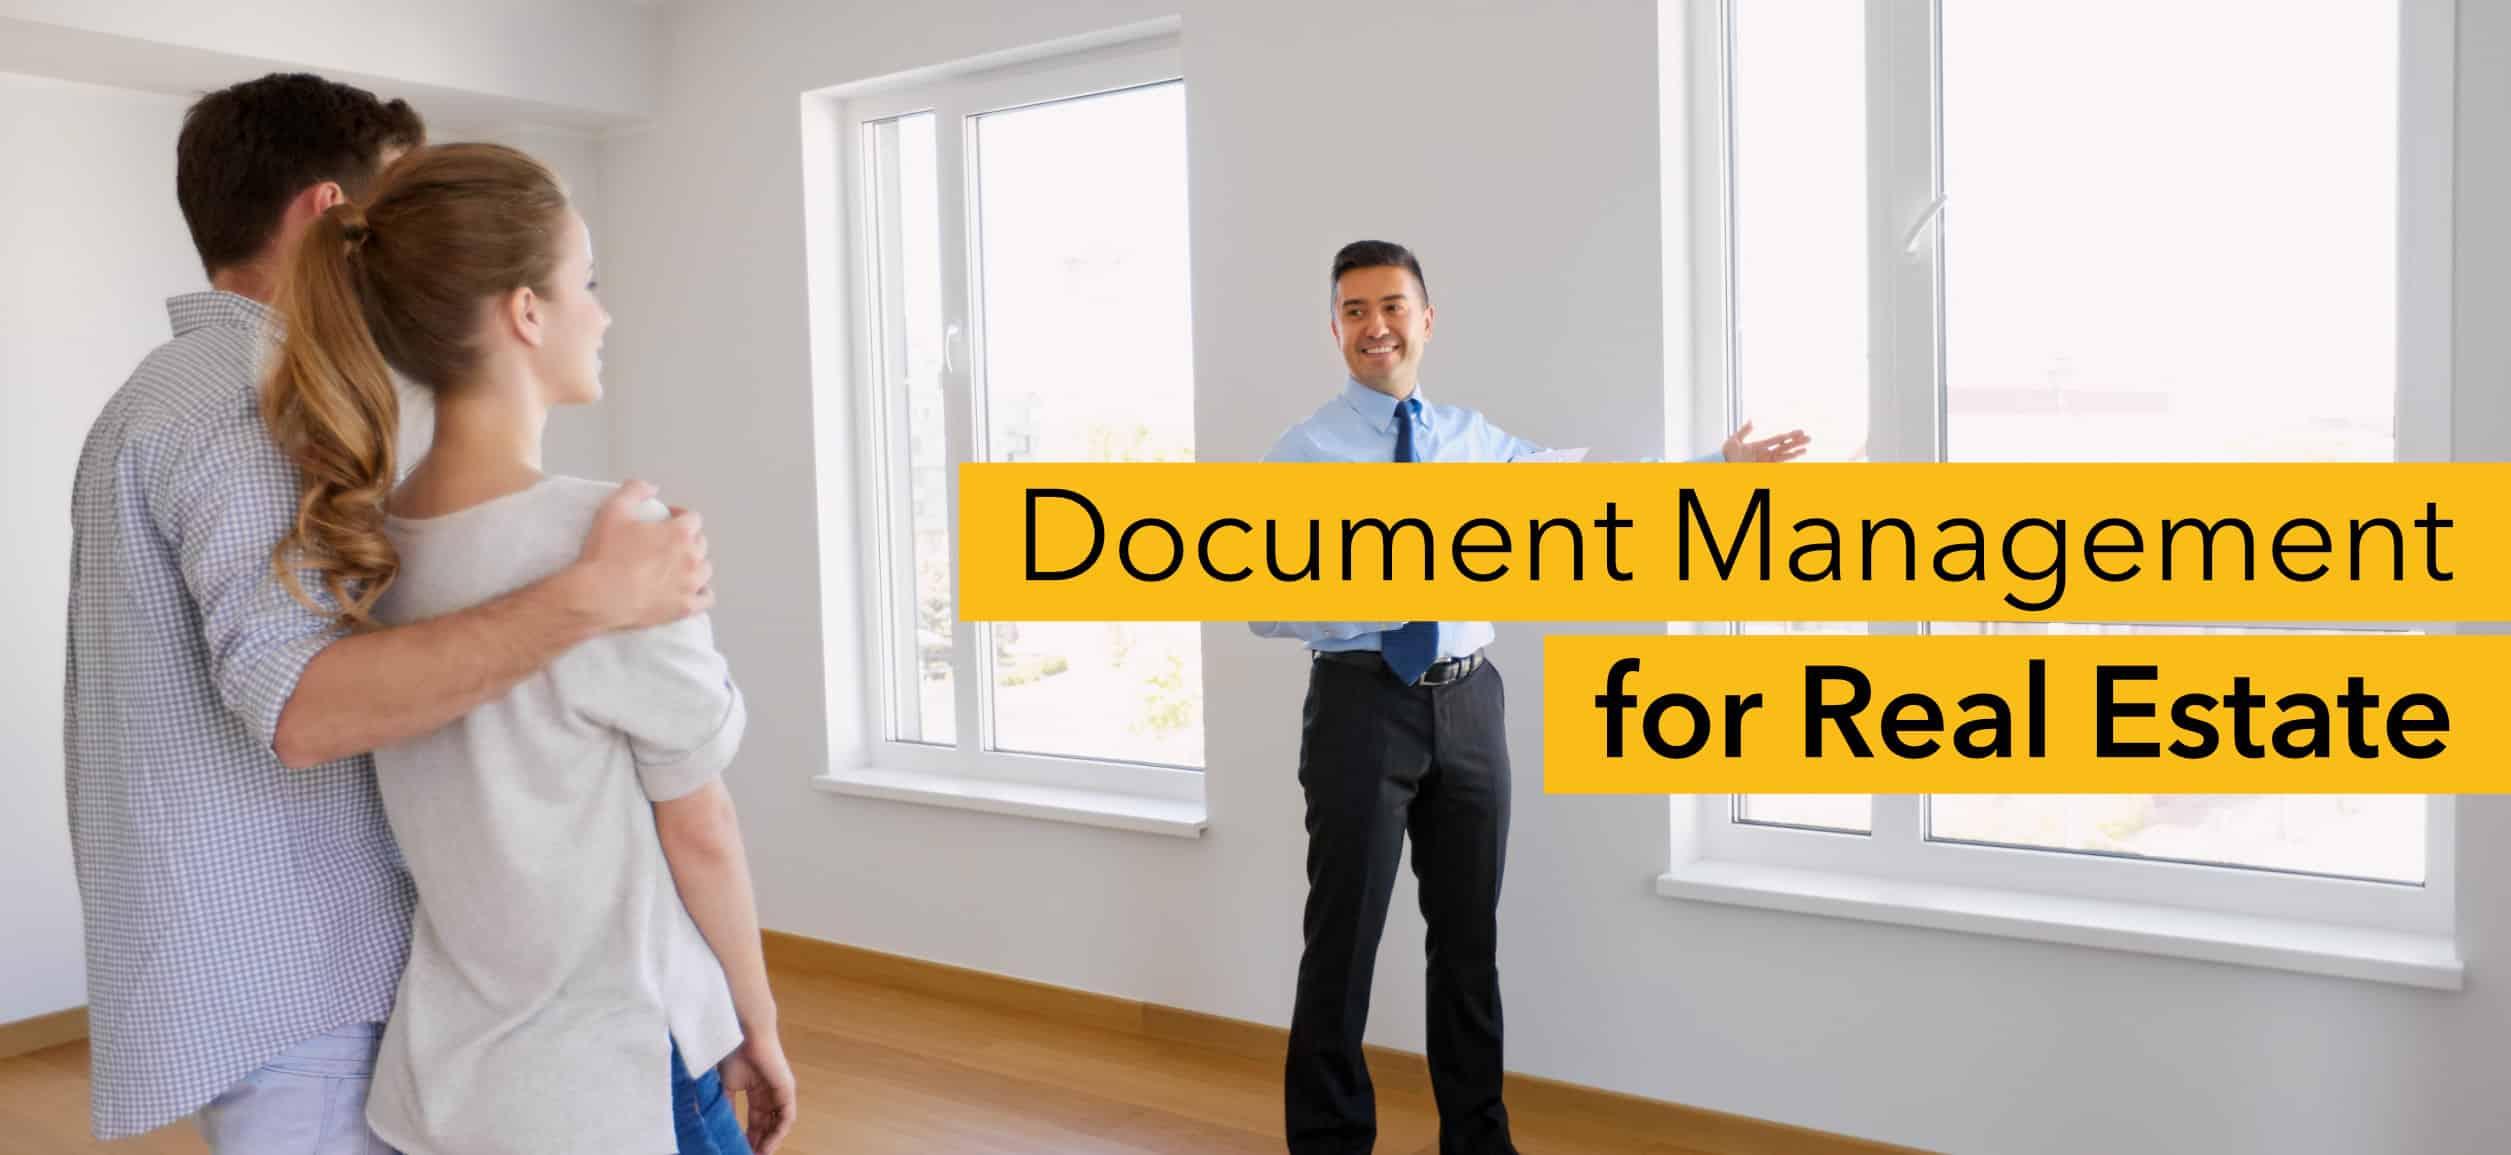 Document management real estate